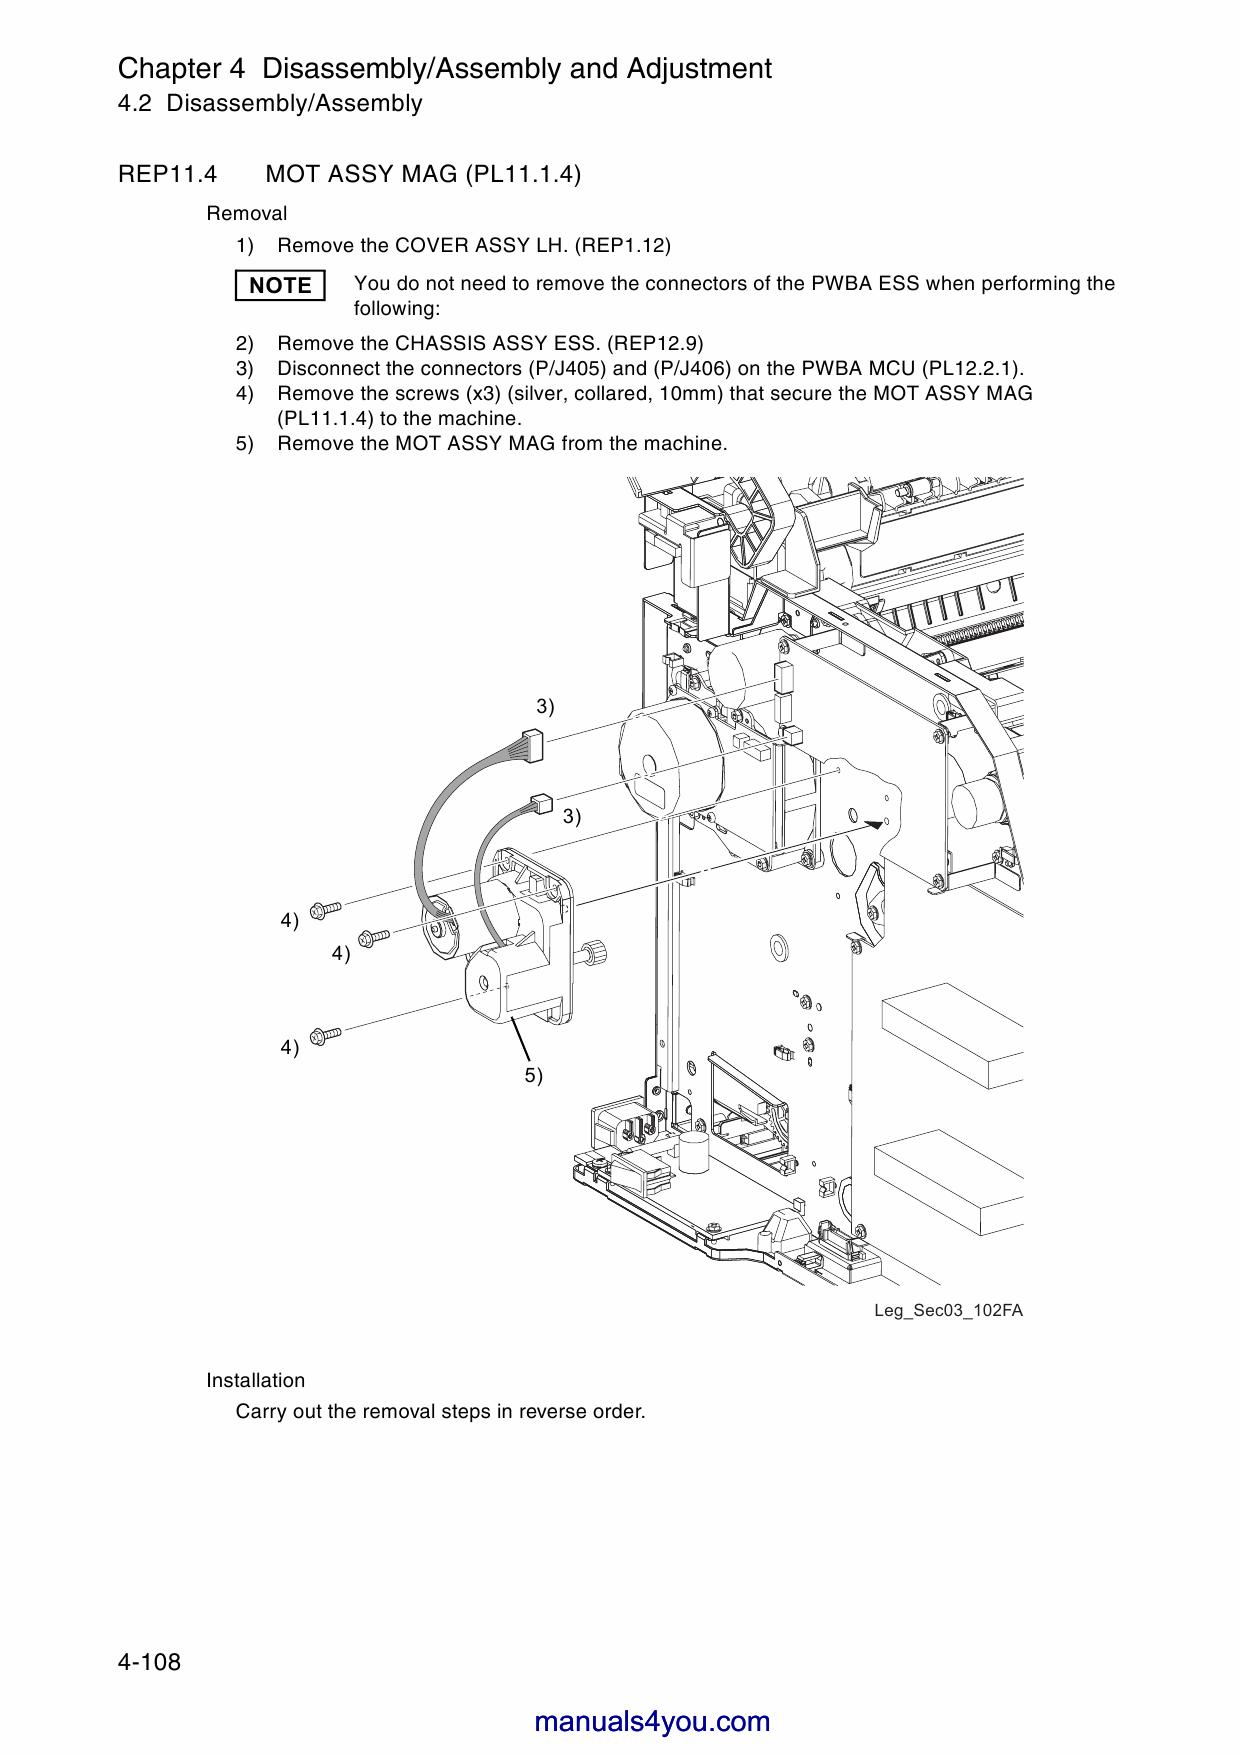 Xerox DocuPrint C525A Fuji ColorLaser   Printer       Parts    List and Service Manual